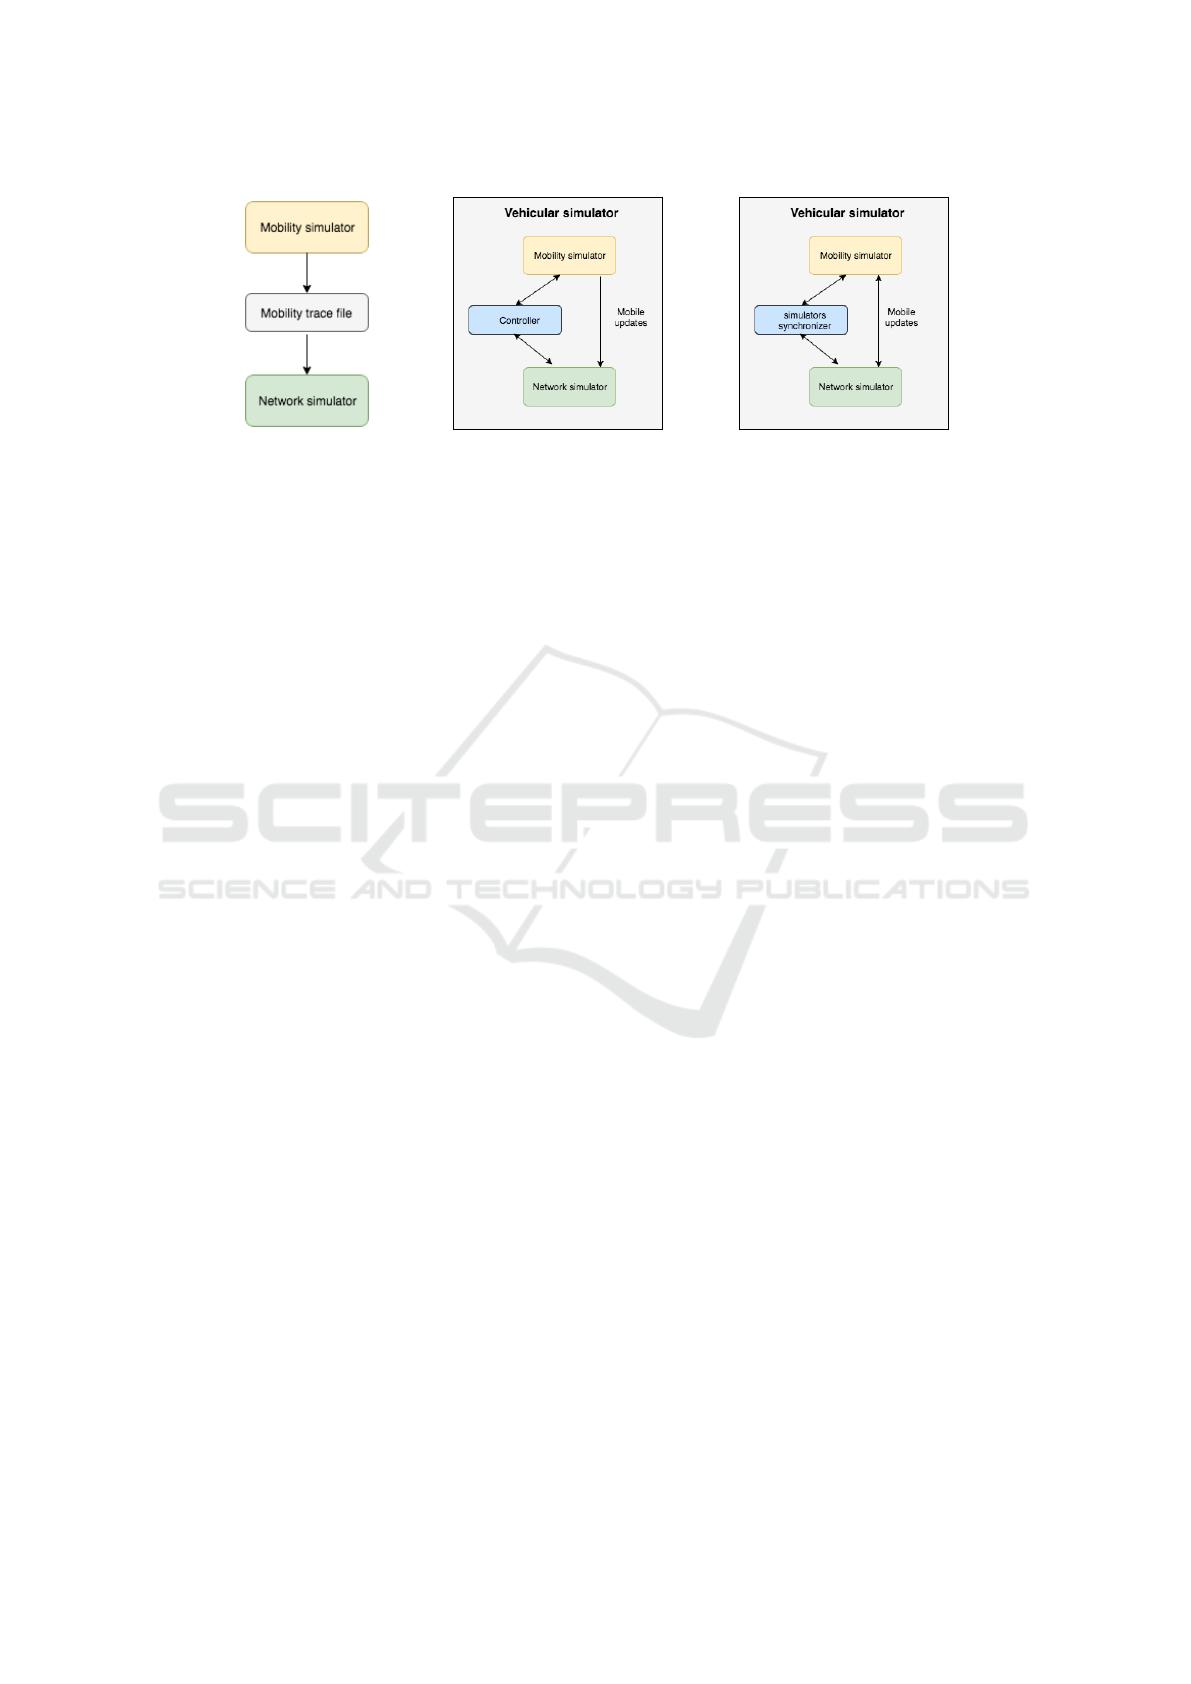 Temporal Evolution of Vehicular Network Simulators